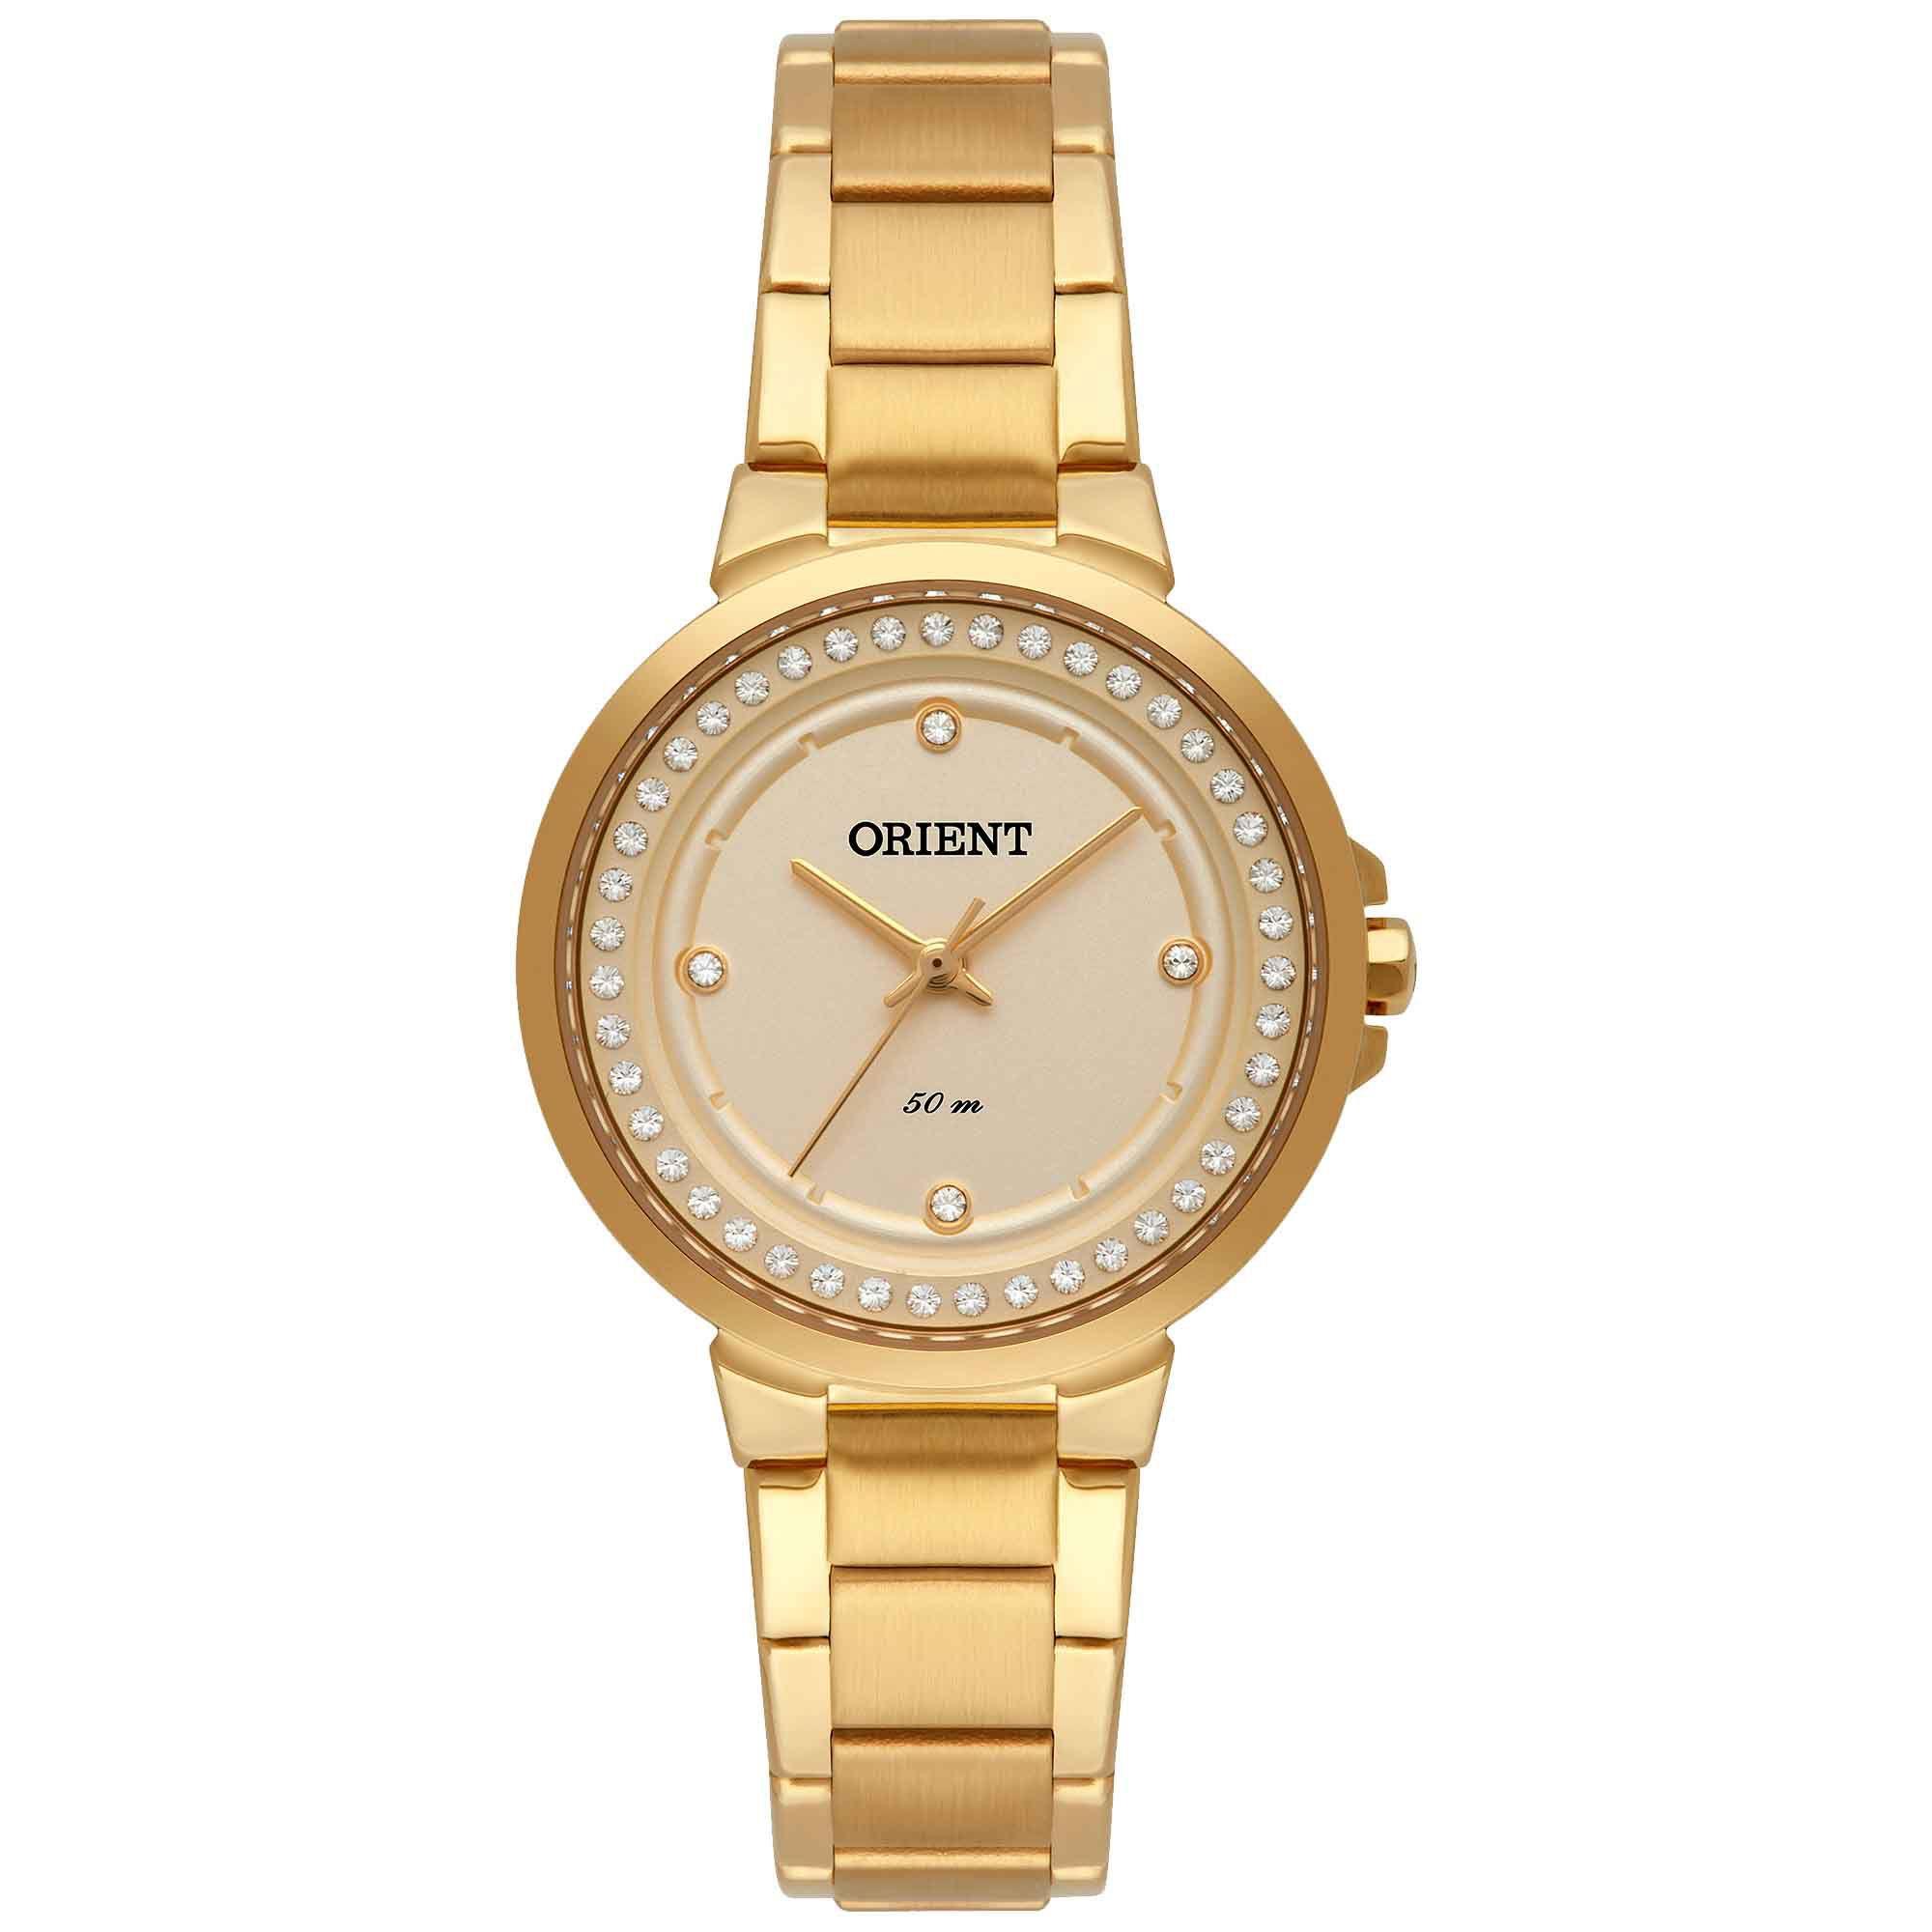 Relógio Feminino Orient FGSS0129 C1KX